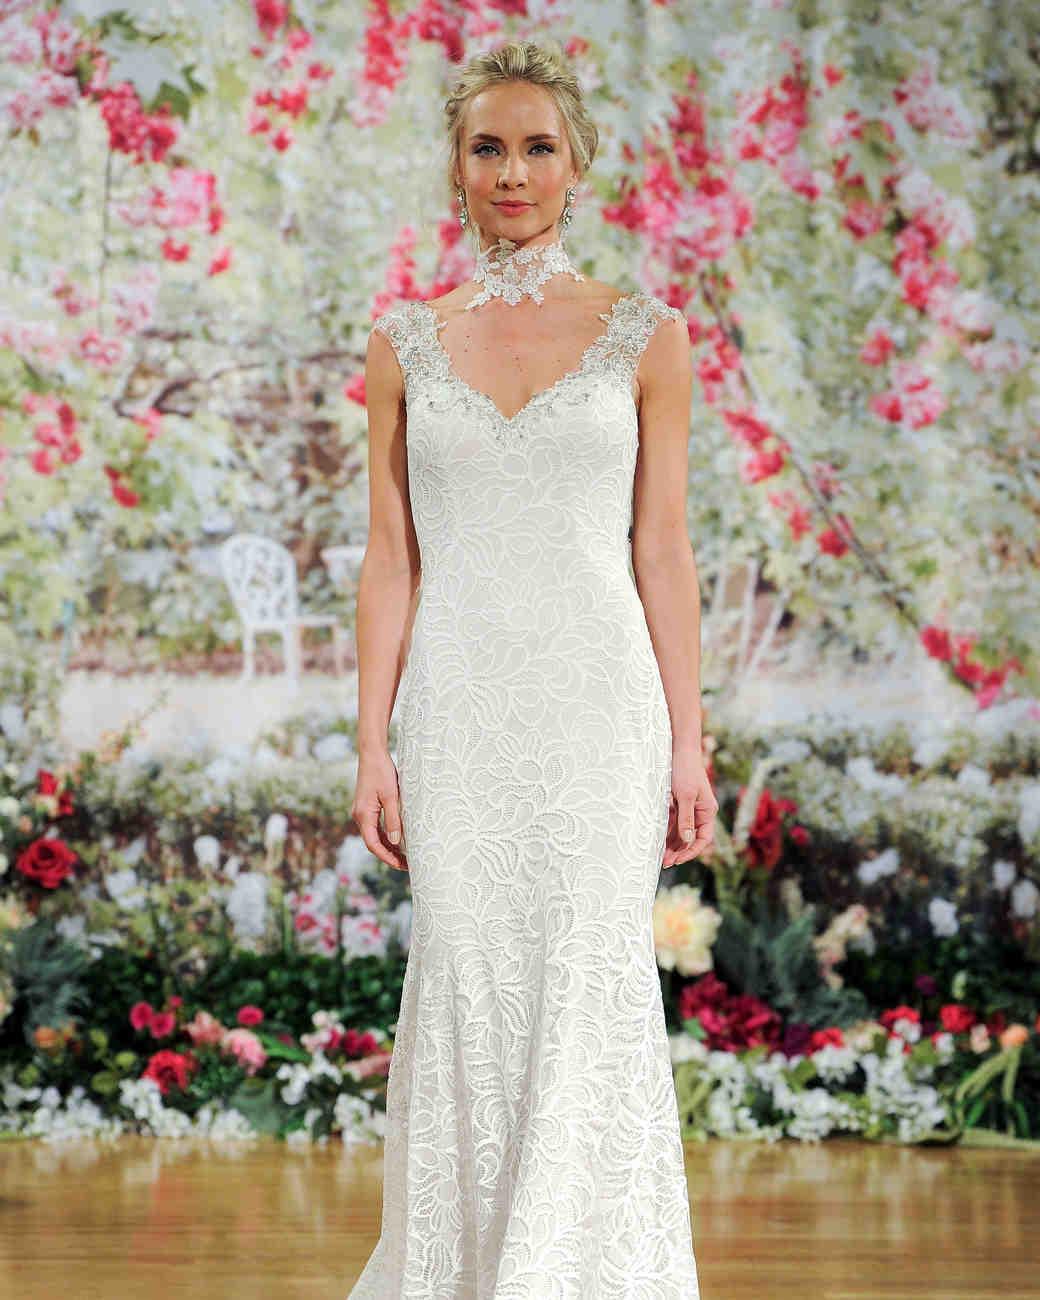 Sottero and Midgley Sleeveless Wedding Dress with Lace